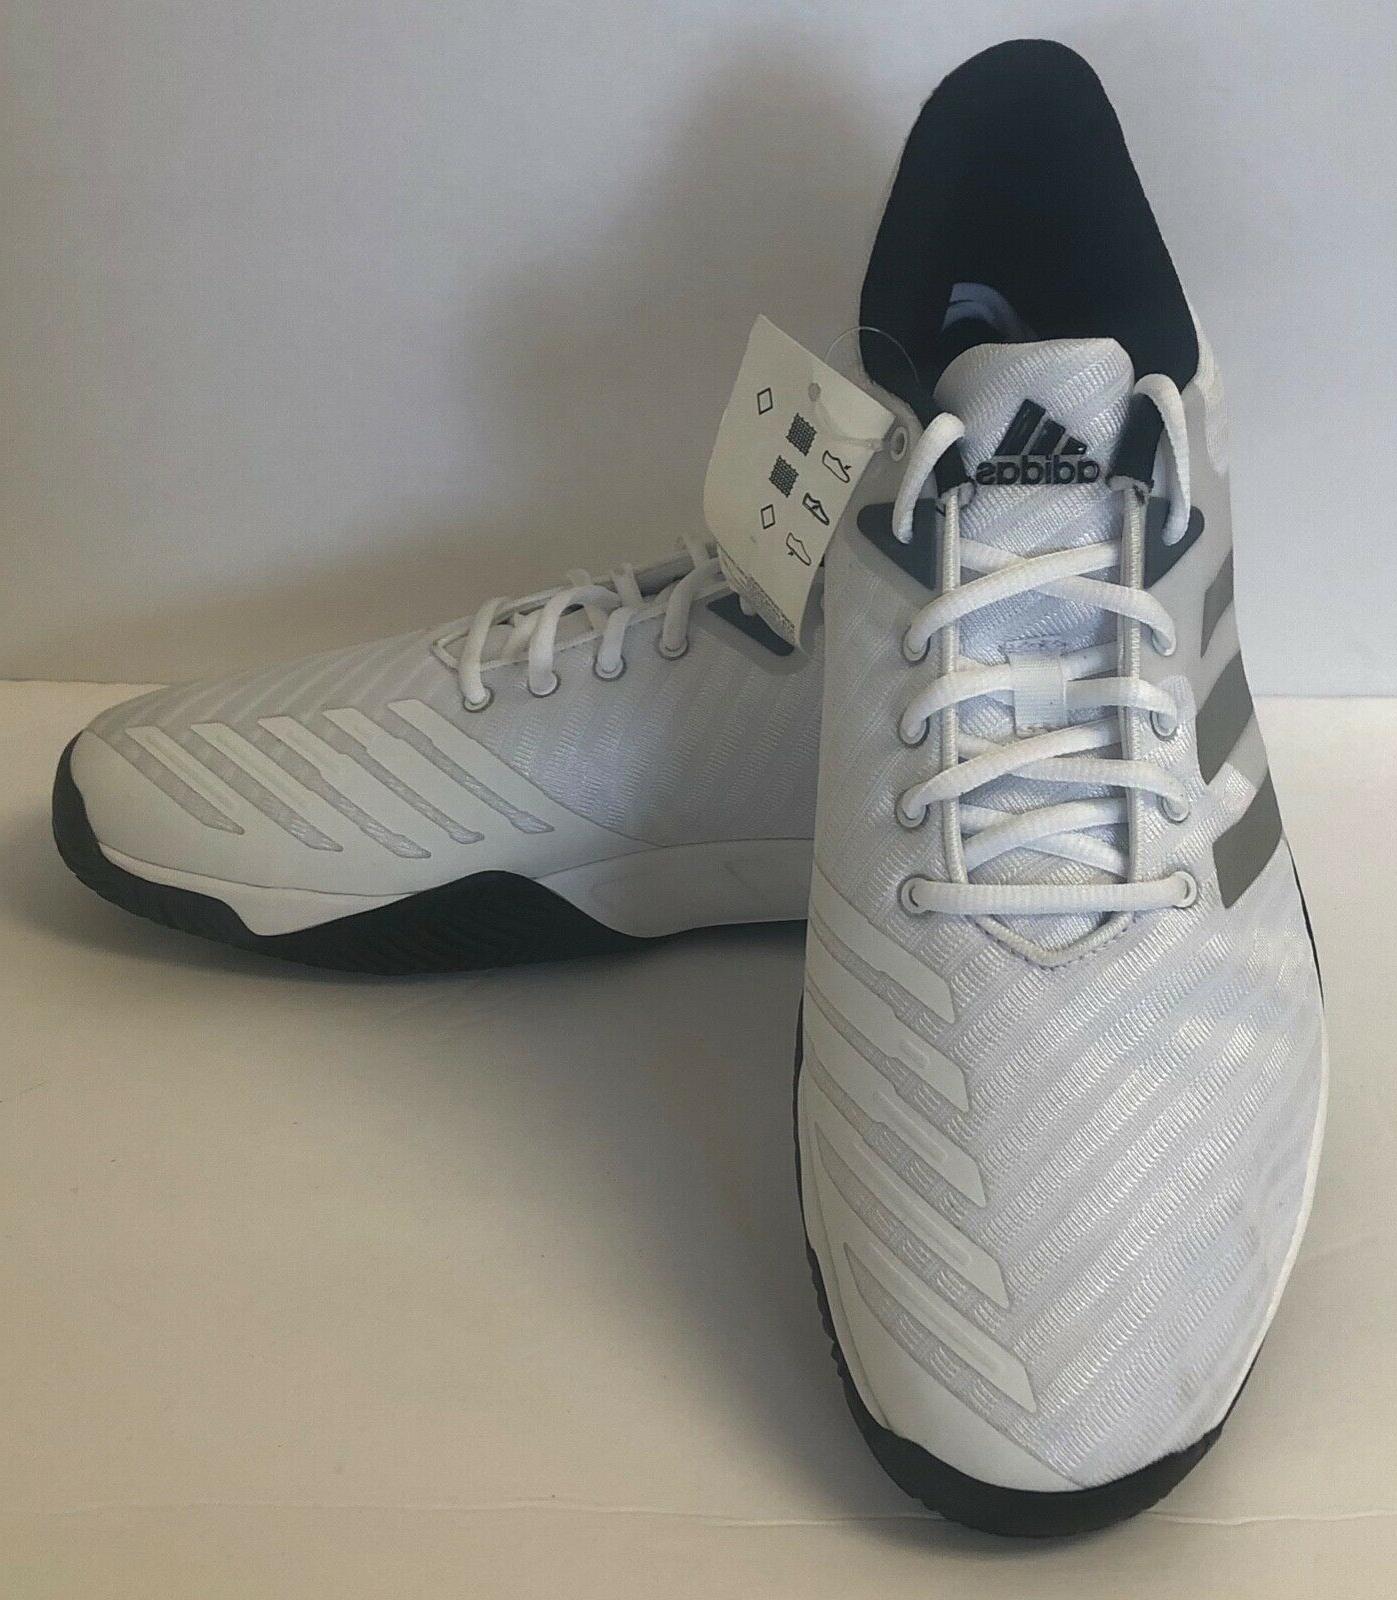 Adidas barricade court CM7817 size -